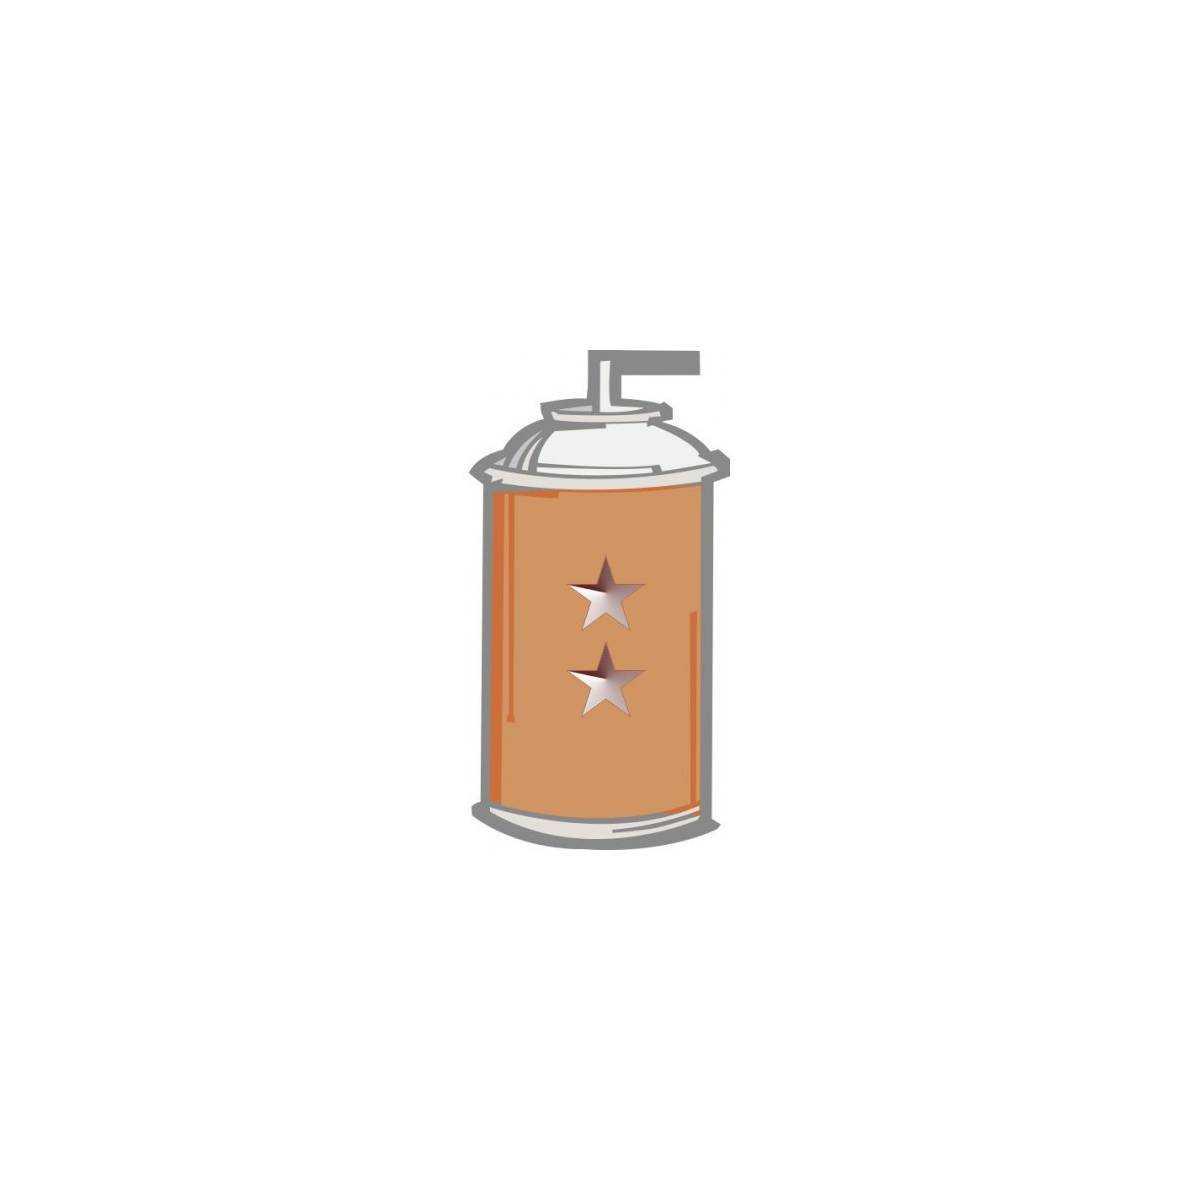 Аэрозольный баллончик 100мл, Великобритания (106681) 106681 Hygiene Vision